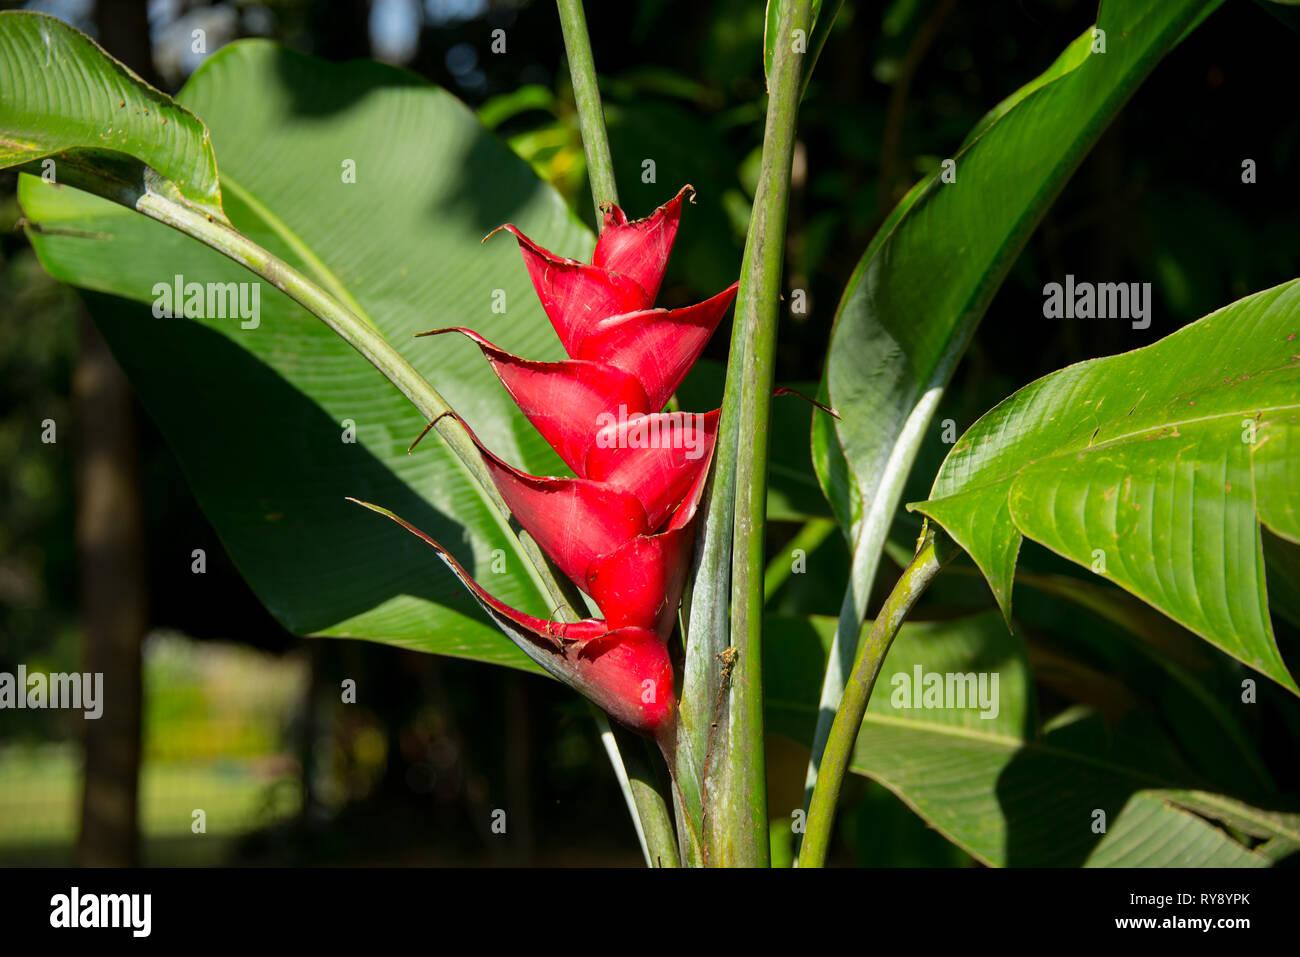 Asia, Sri Lanka, Kandy, Royal Botanic Garden Peradeniya, Heliconia rostrata, hanging lobster claw - Stock Image